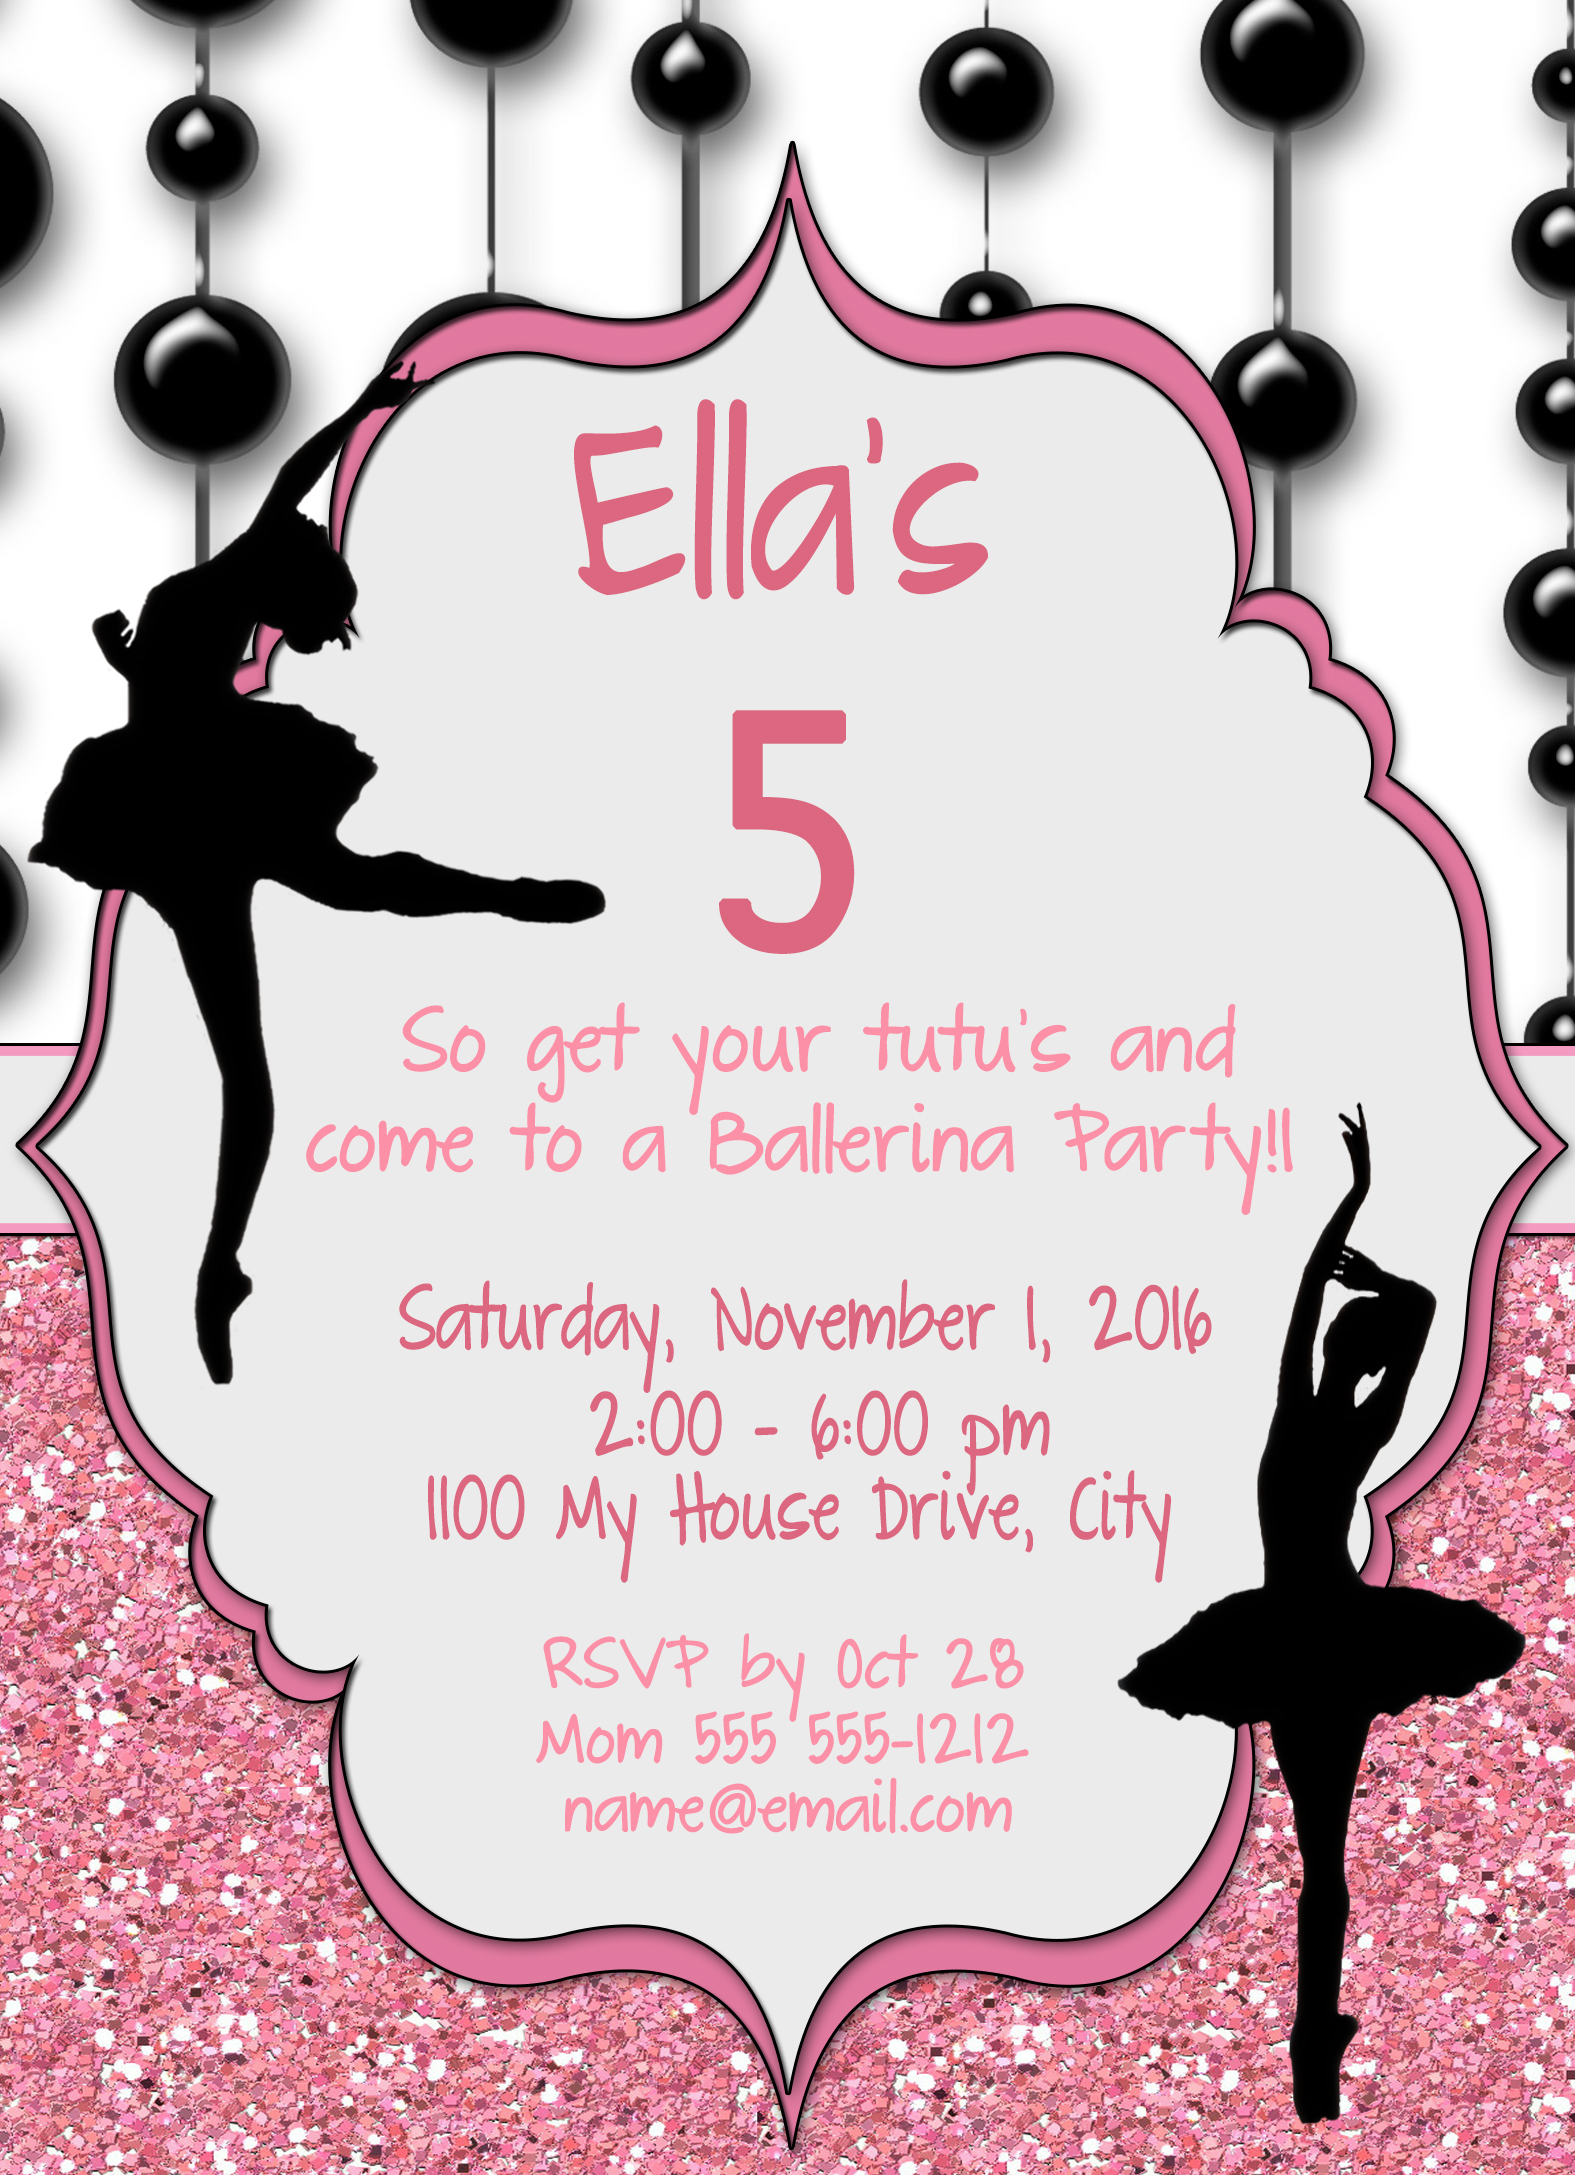 Ballerina Silohuette Personalized Birthday Invitation 2 Sided ...